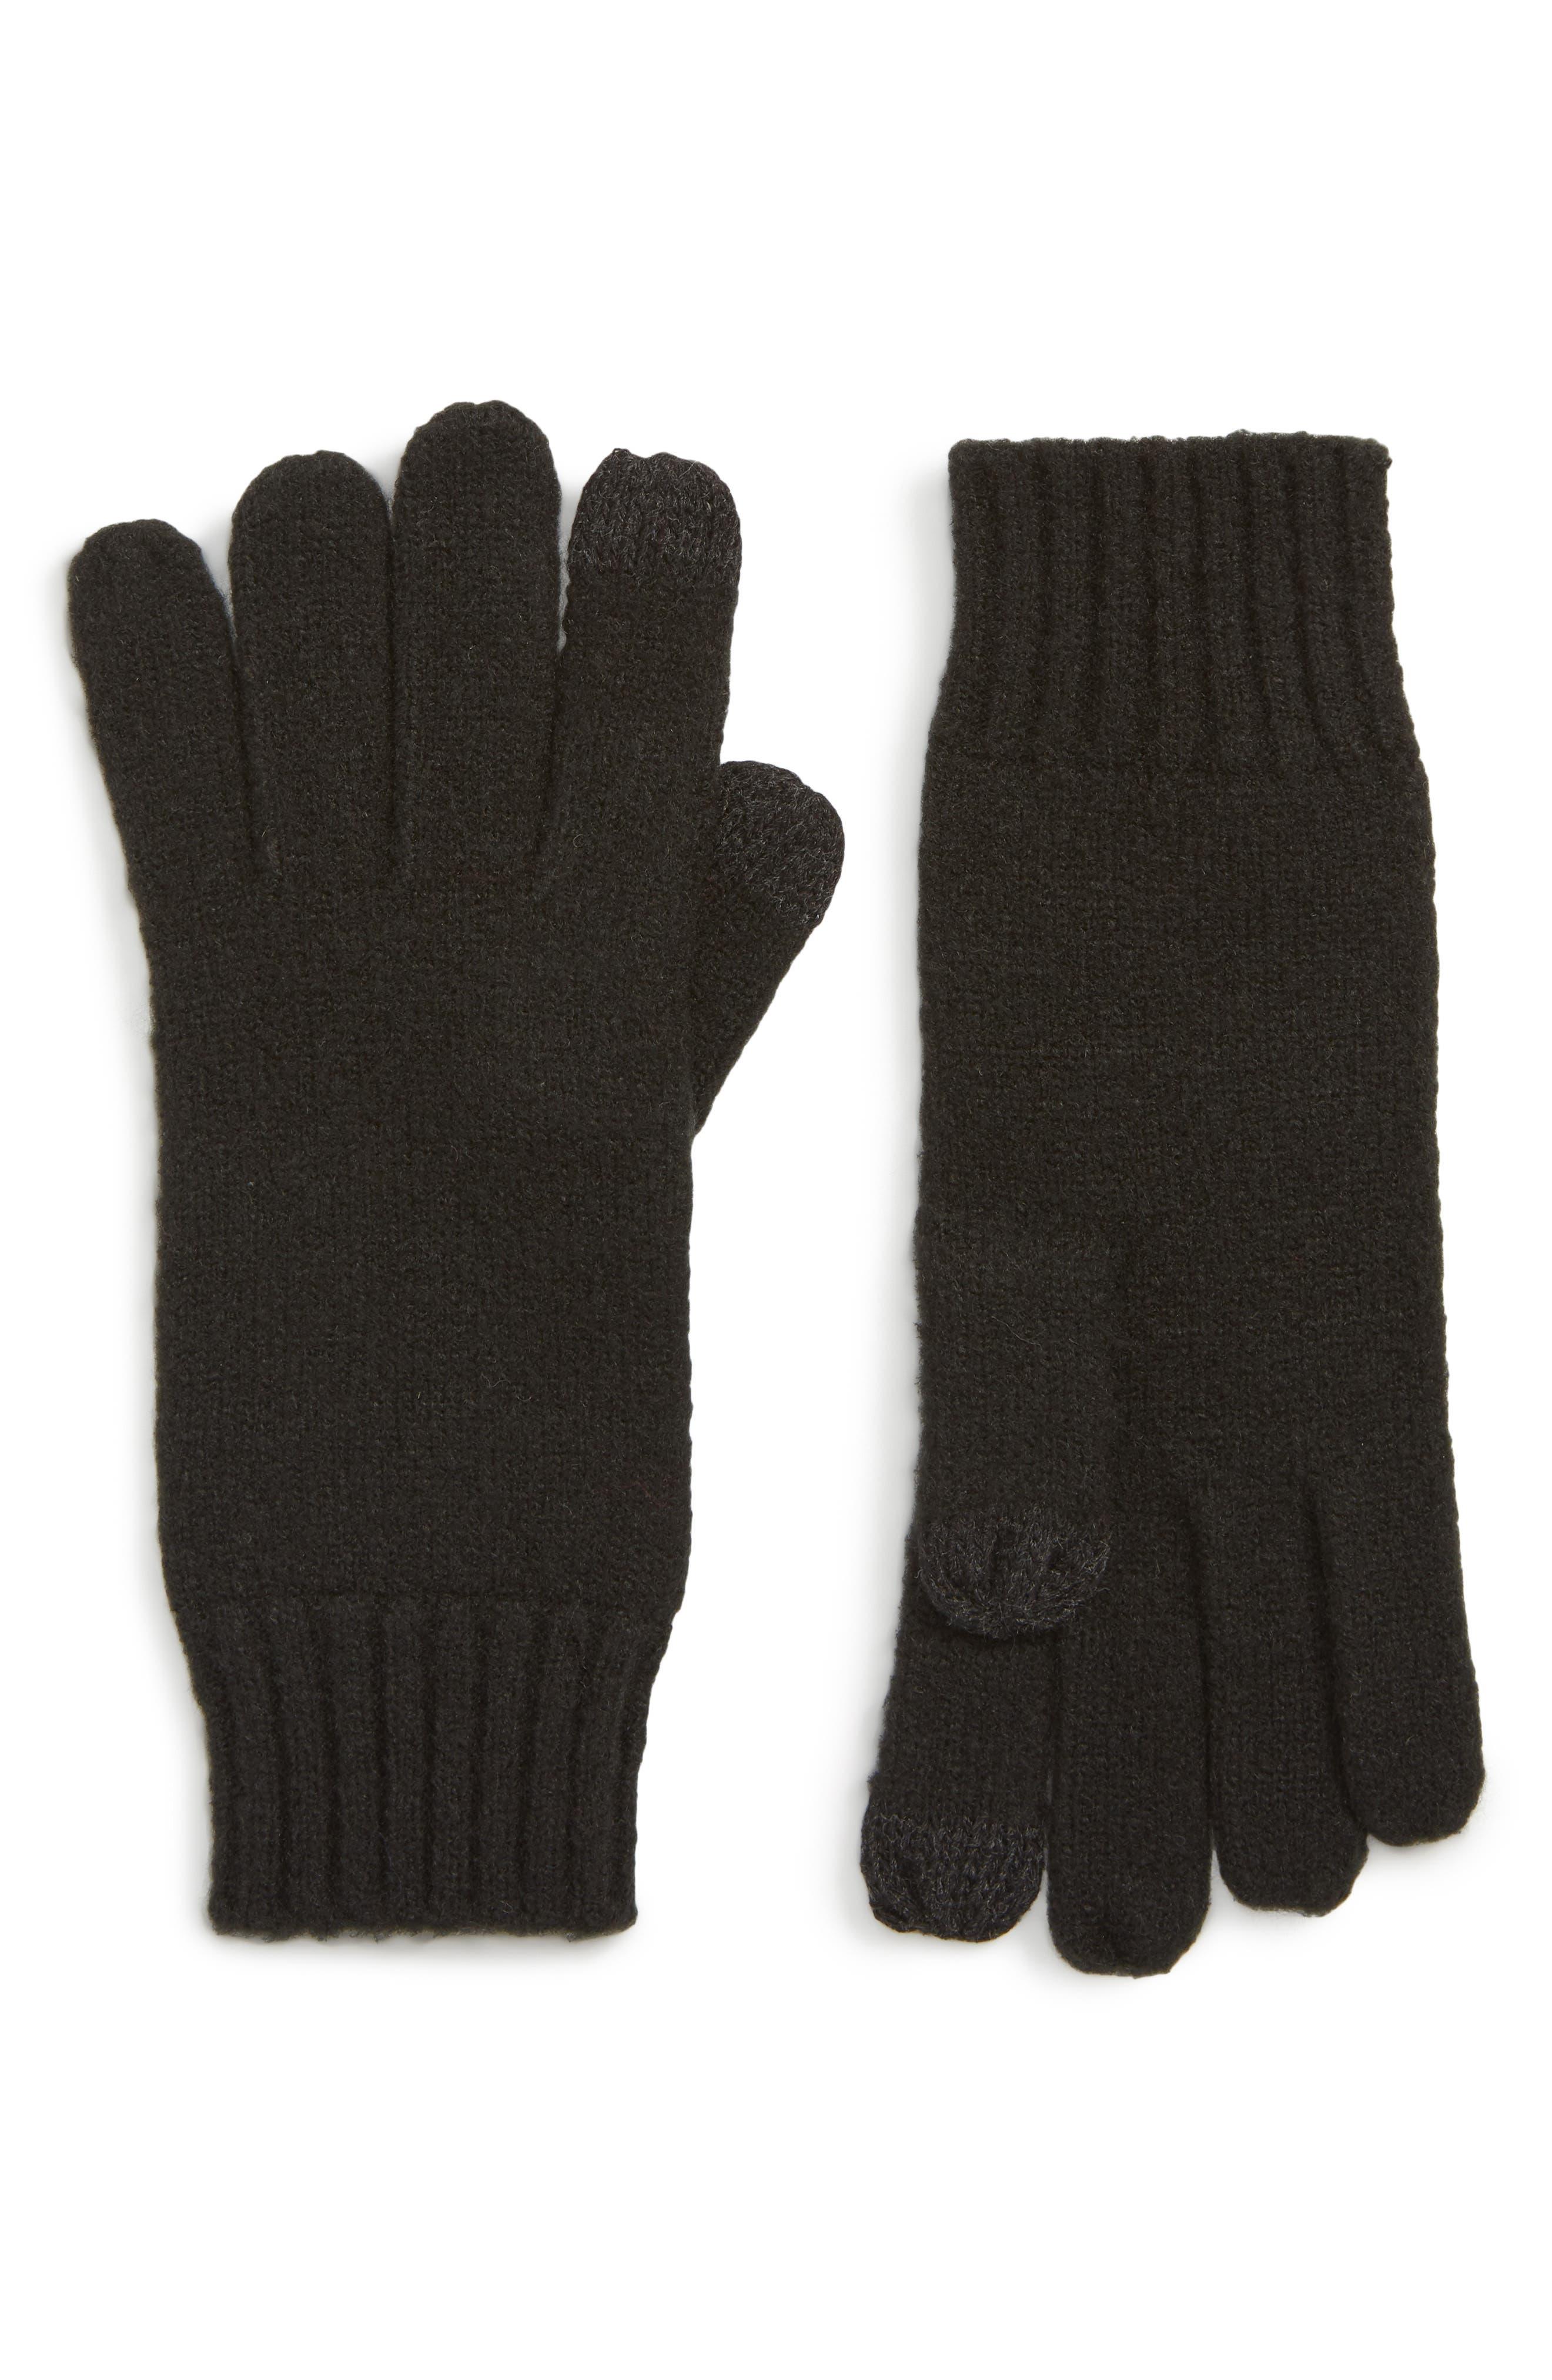 Knit Tech Gloves,                             Main thumbnail 1, color,                             BLACK